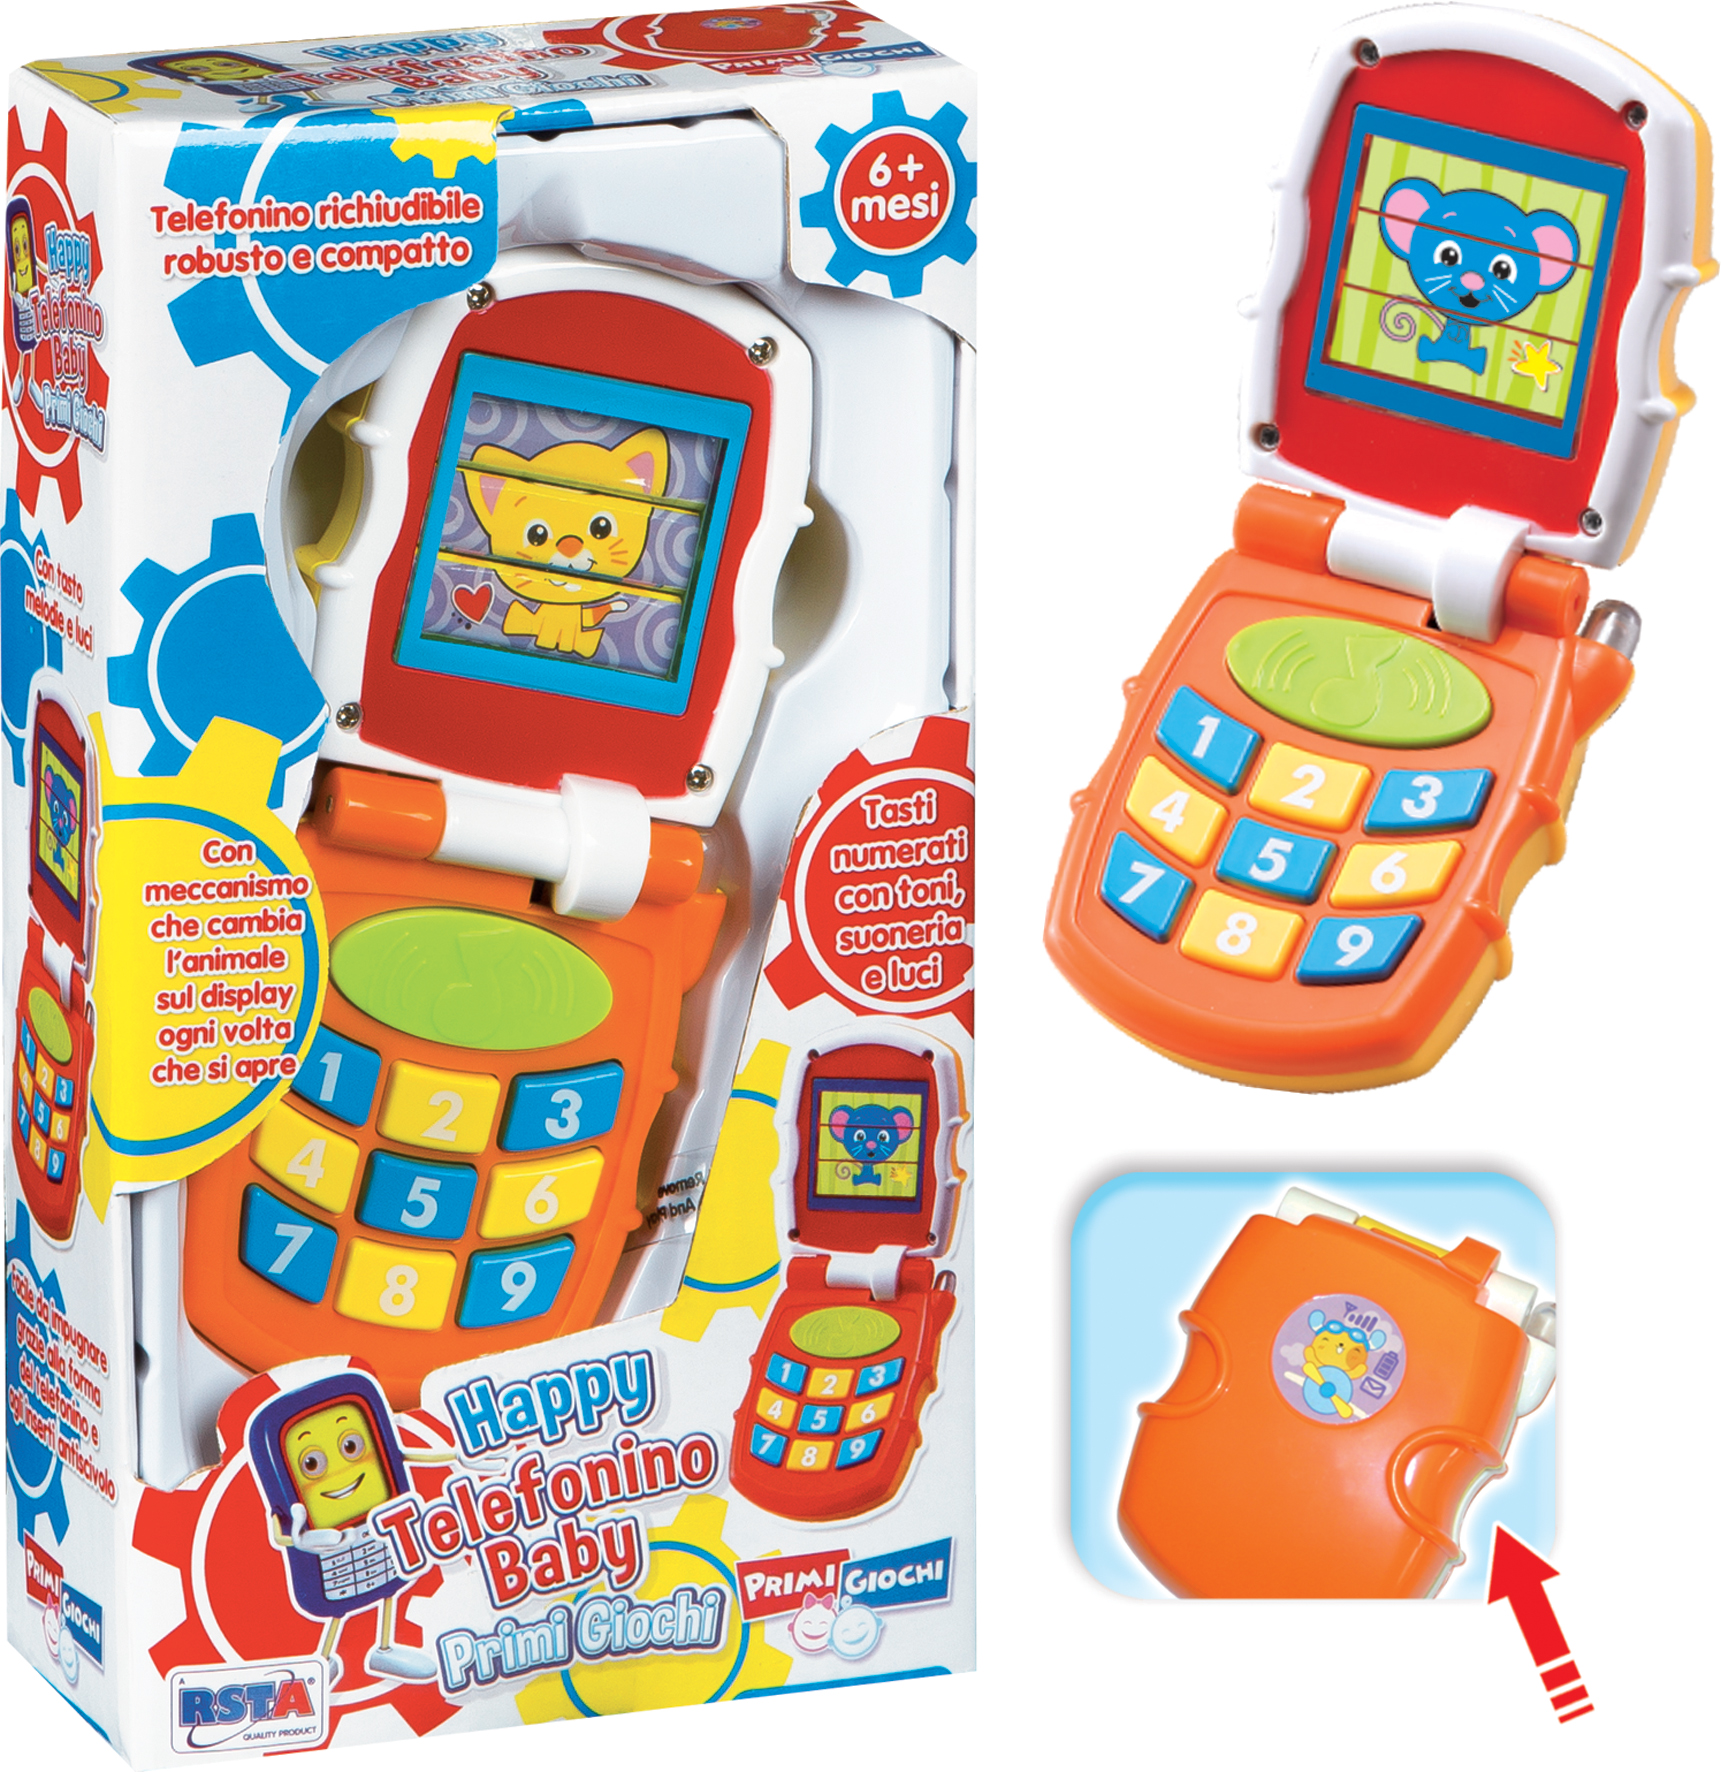 TELEFONINO BABY COLORI ASS